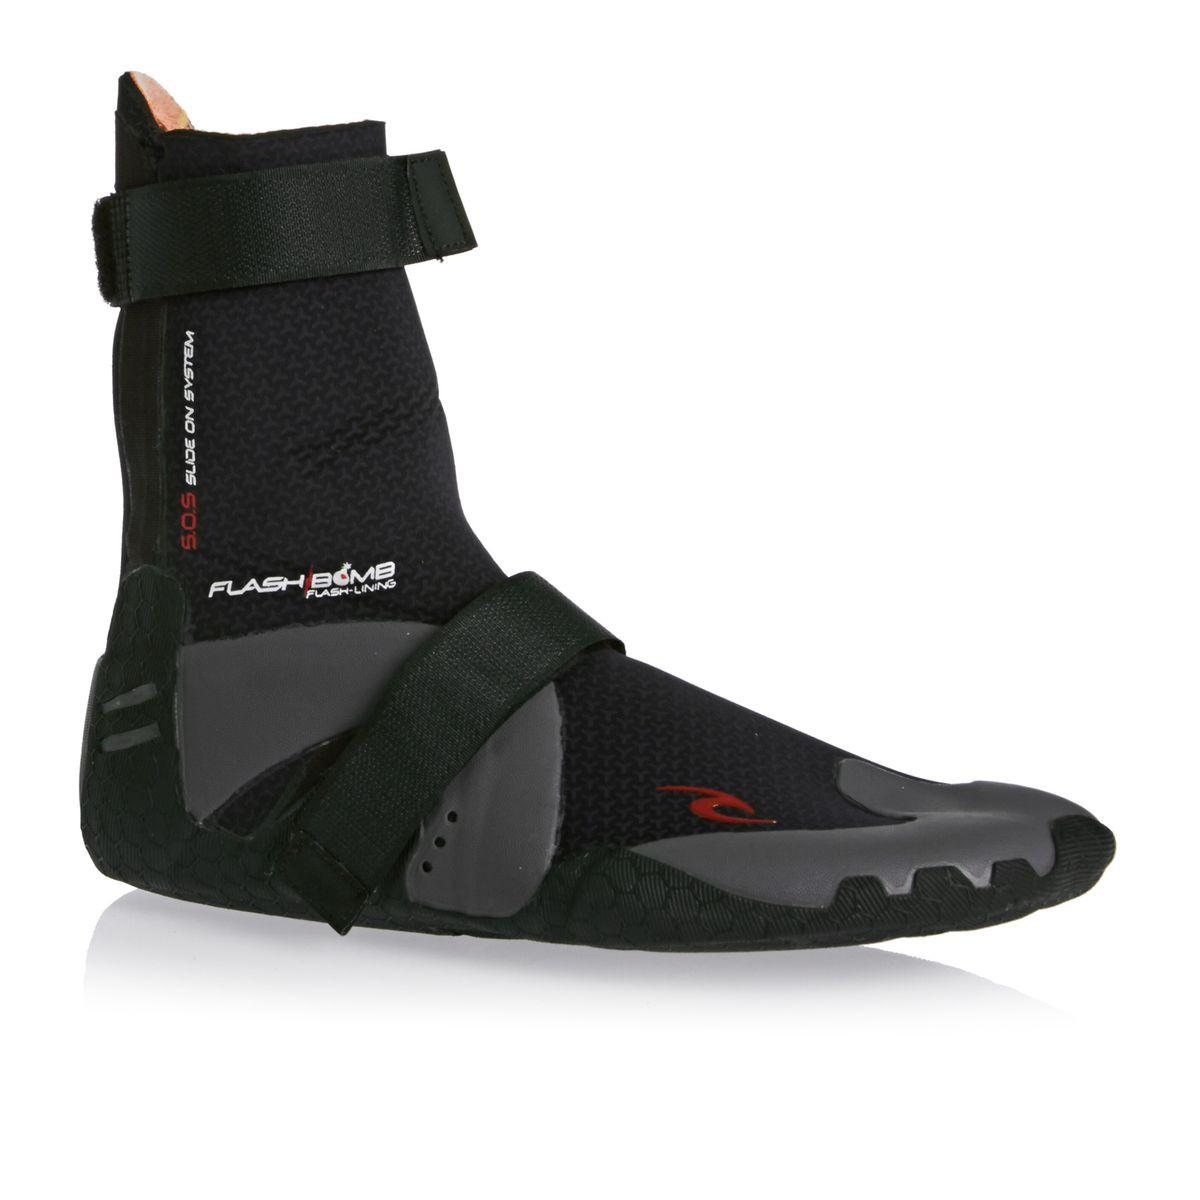 Rip Curl Flashbomb 3mm Hidden Split Toe Wetsuit Boots - Black